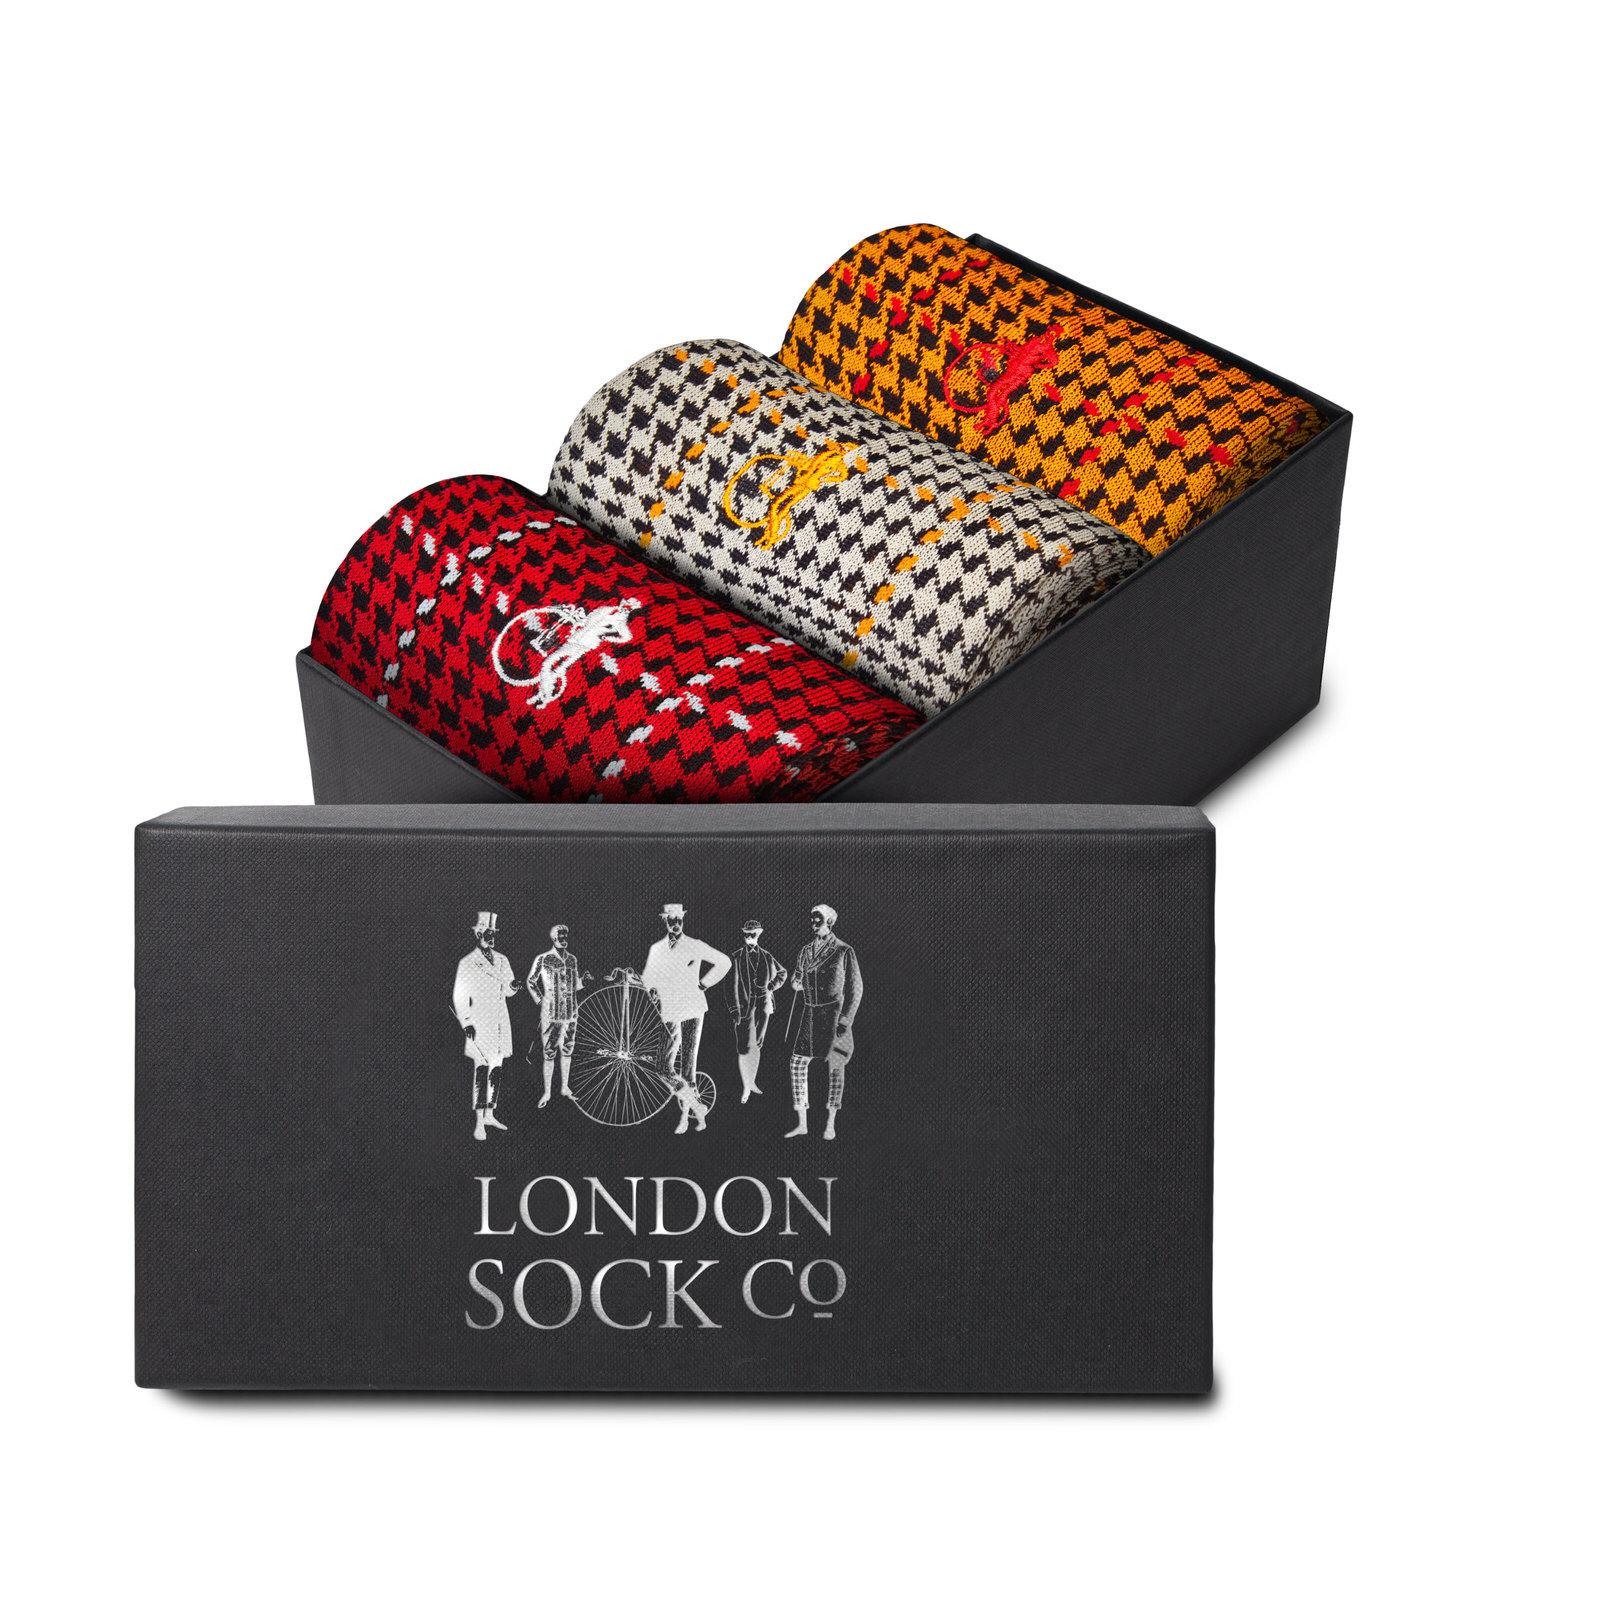 LONDON SOCK COMPANY OTTAWAY GIFT BOX - 3 PAIR